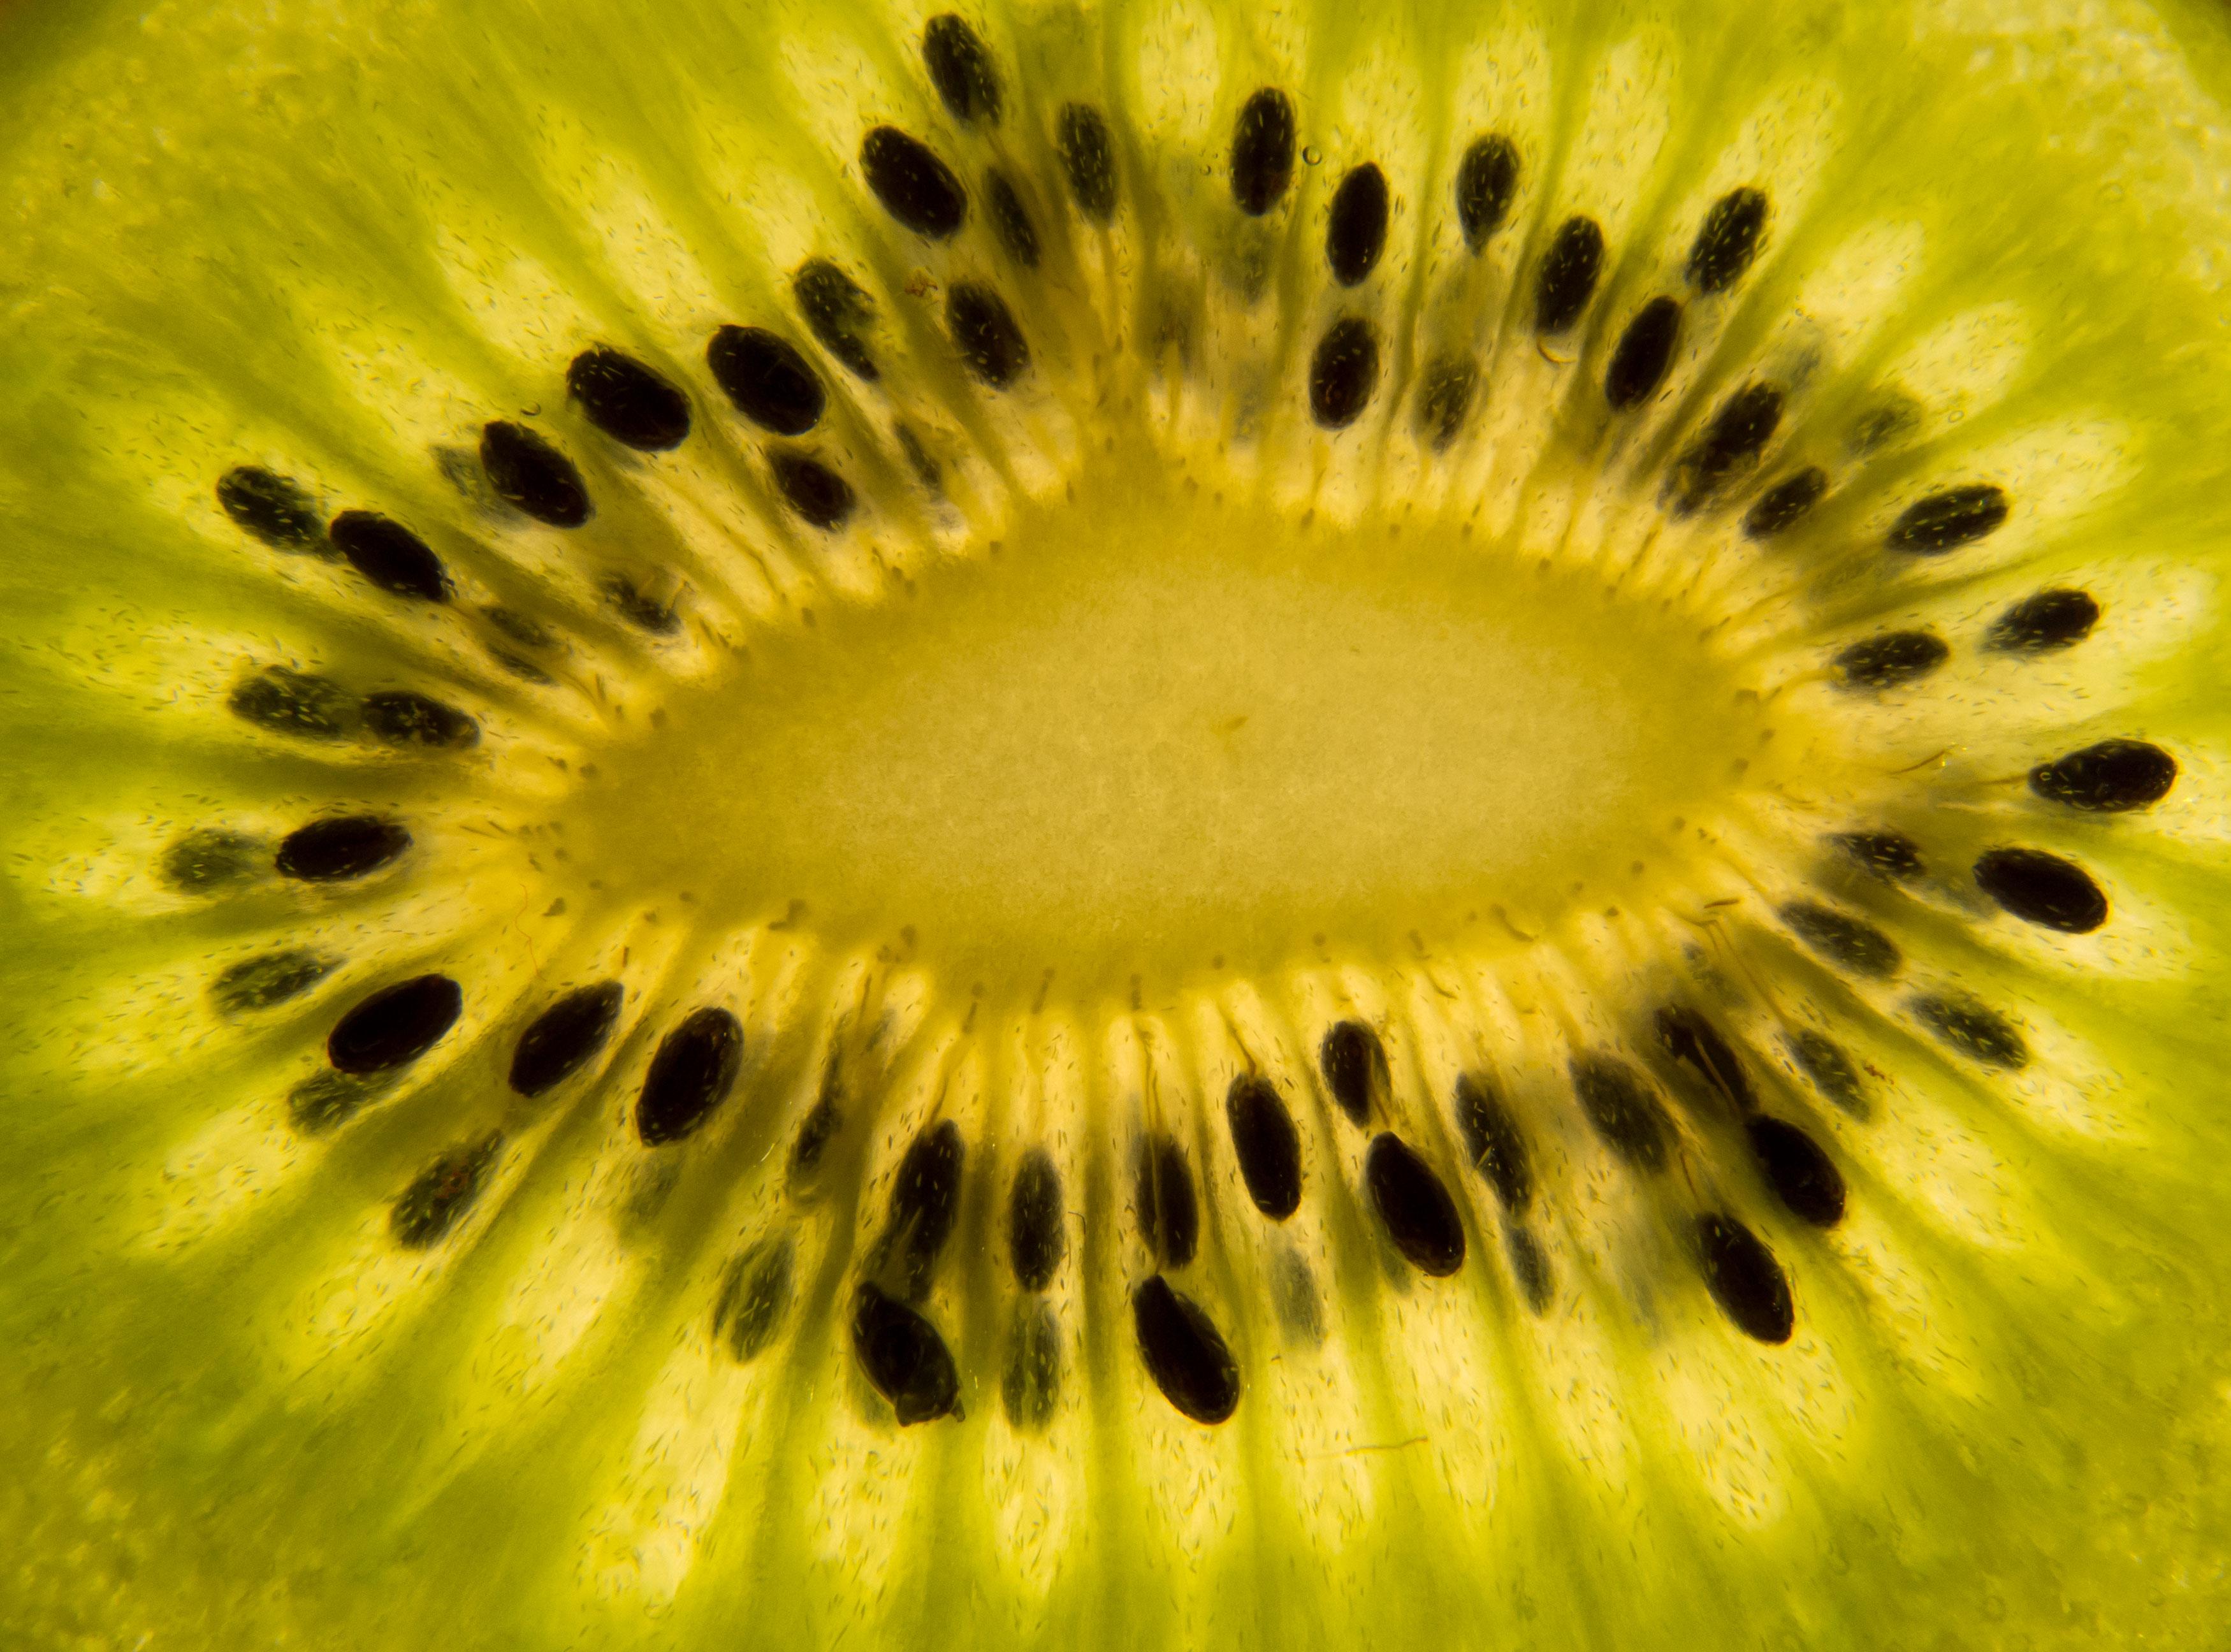 FREE IMAGE: Kiwi slice closeup | Libreshot Public Domain ...